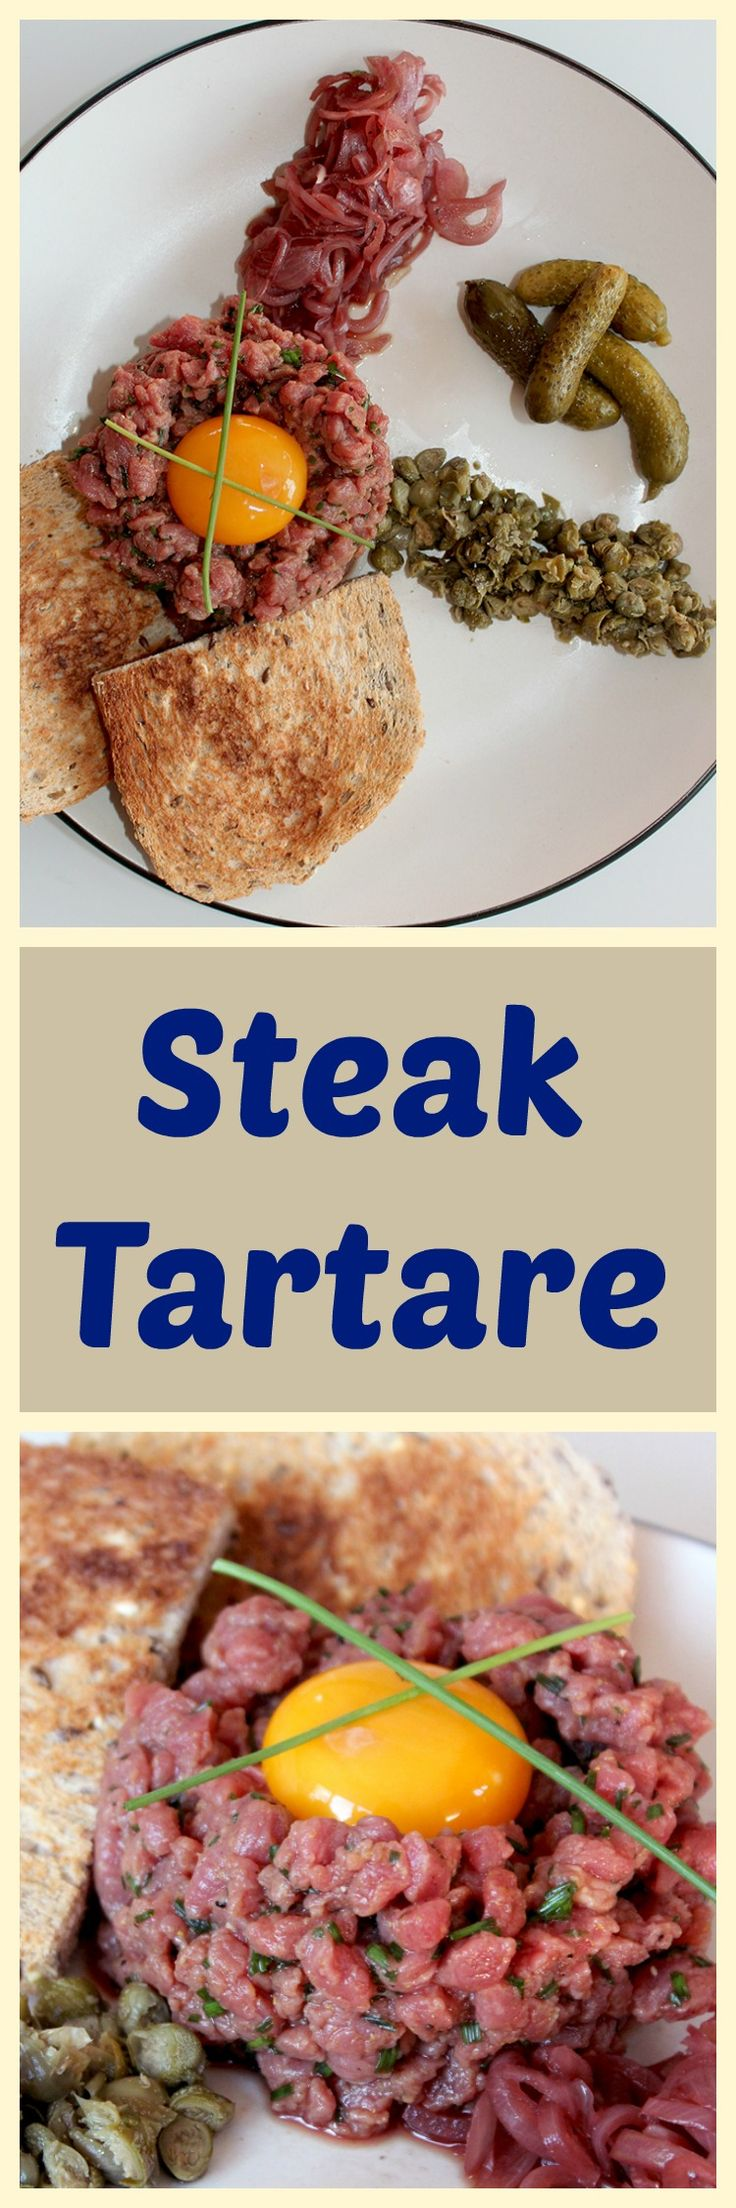 how to cook steak tartare